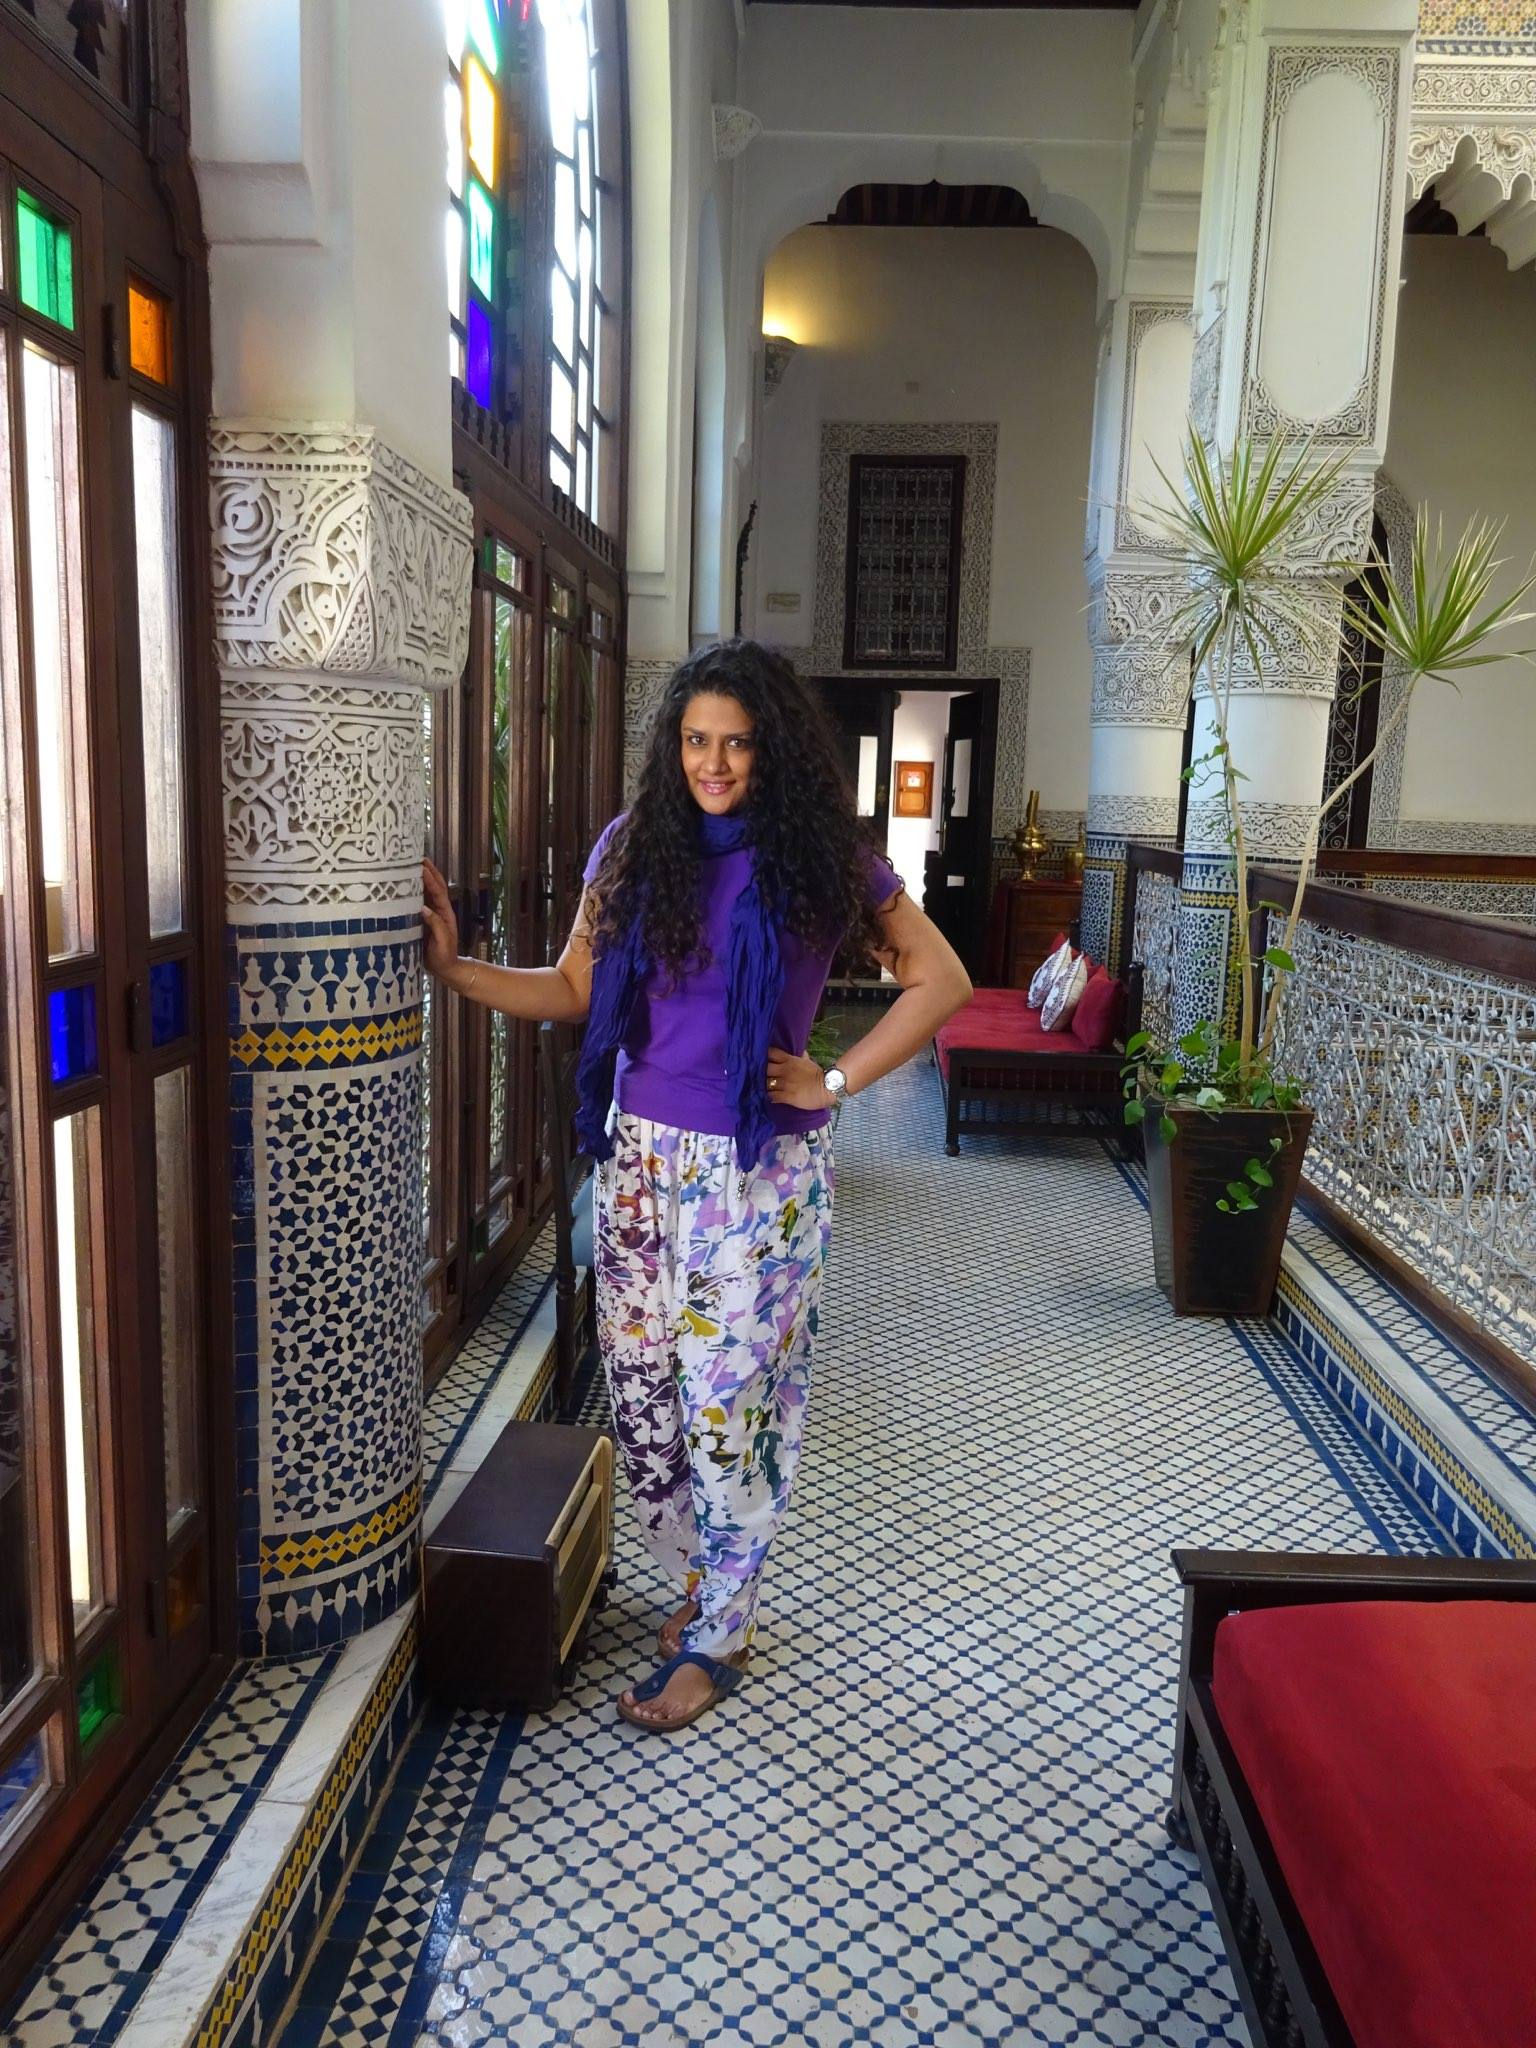 Riad Fes  Ralph Lauren T-shirt, Pashma Pants, Scarf from Koovs.com ,Birkenstock Sandals